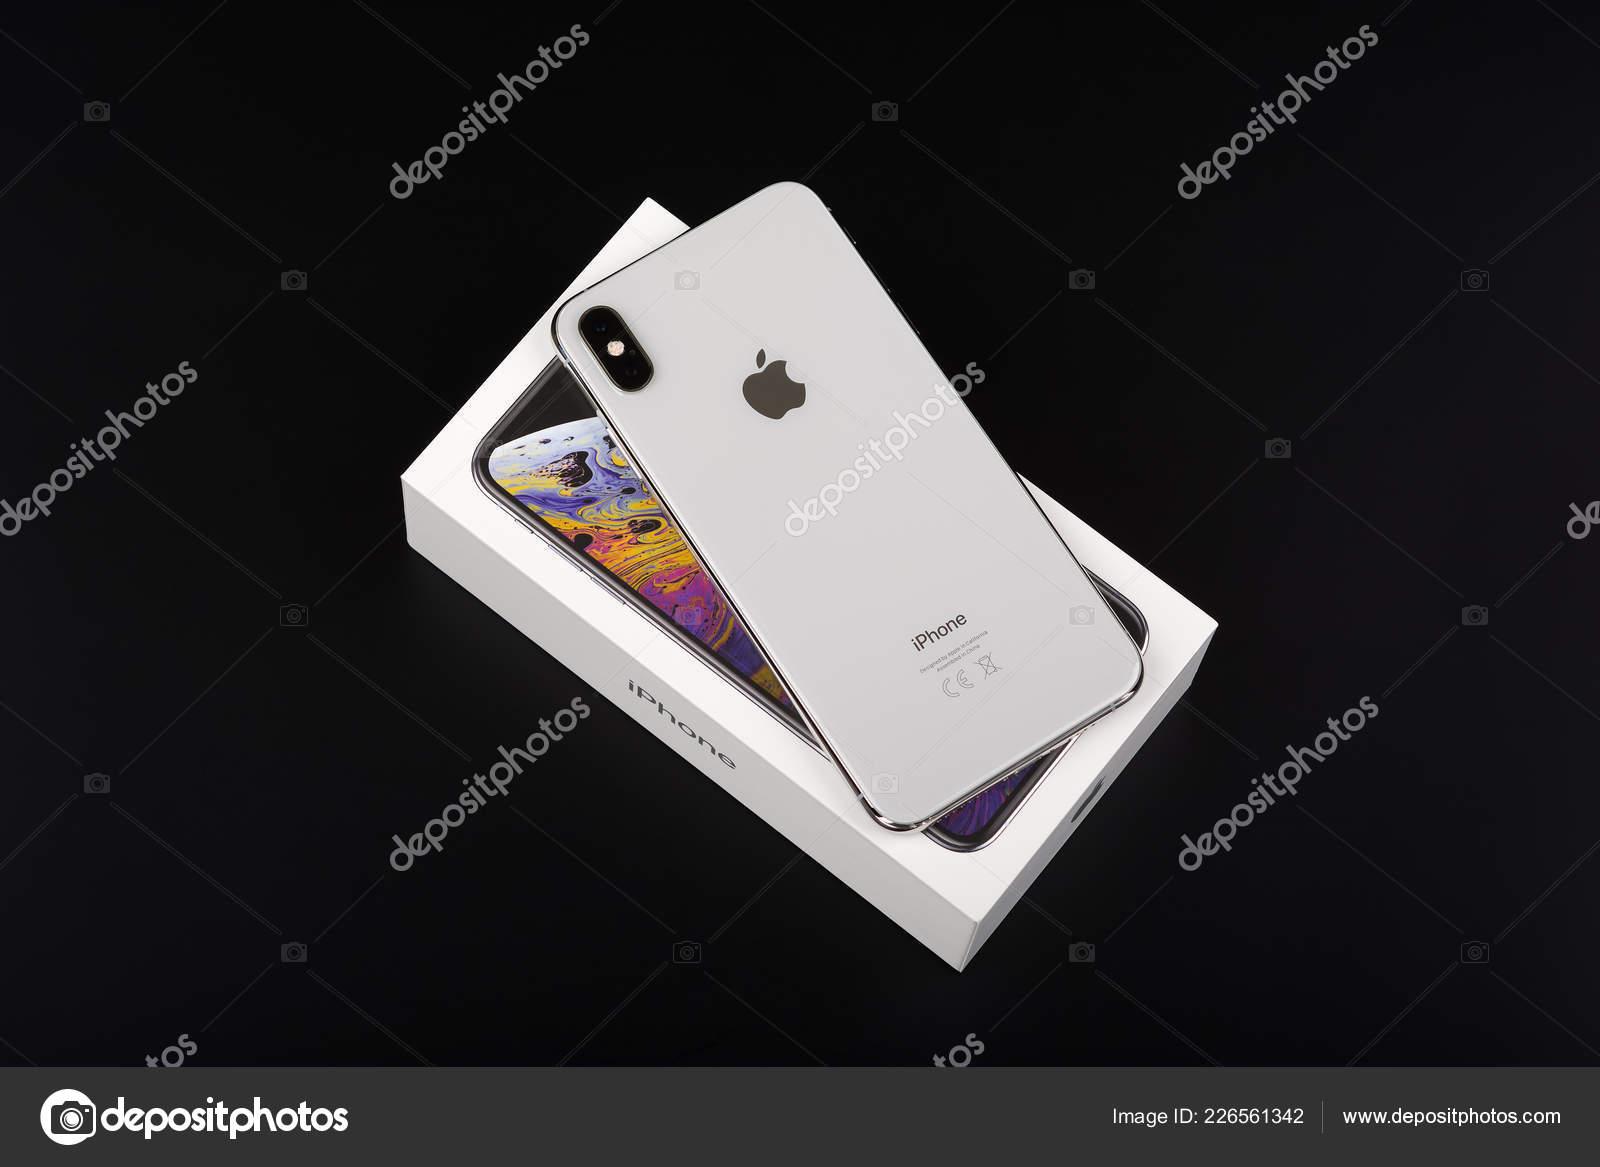 Burgas Bulgaria November 2018 Apple Iphone Max Silver Black